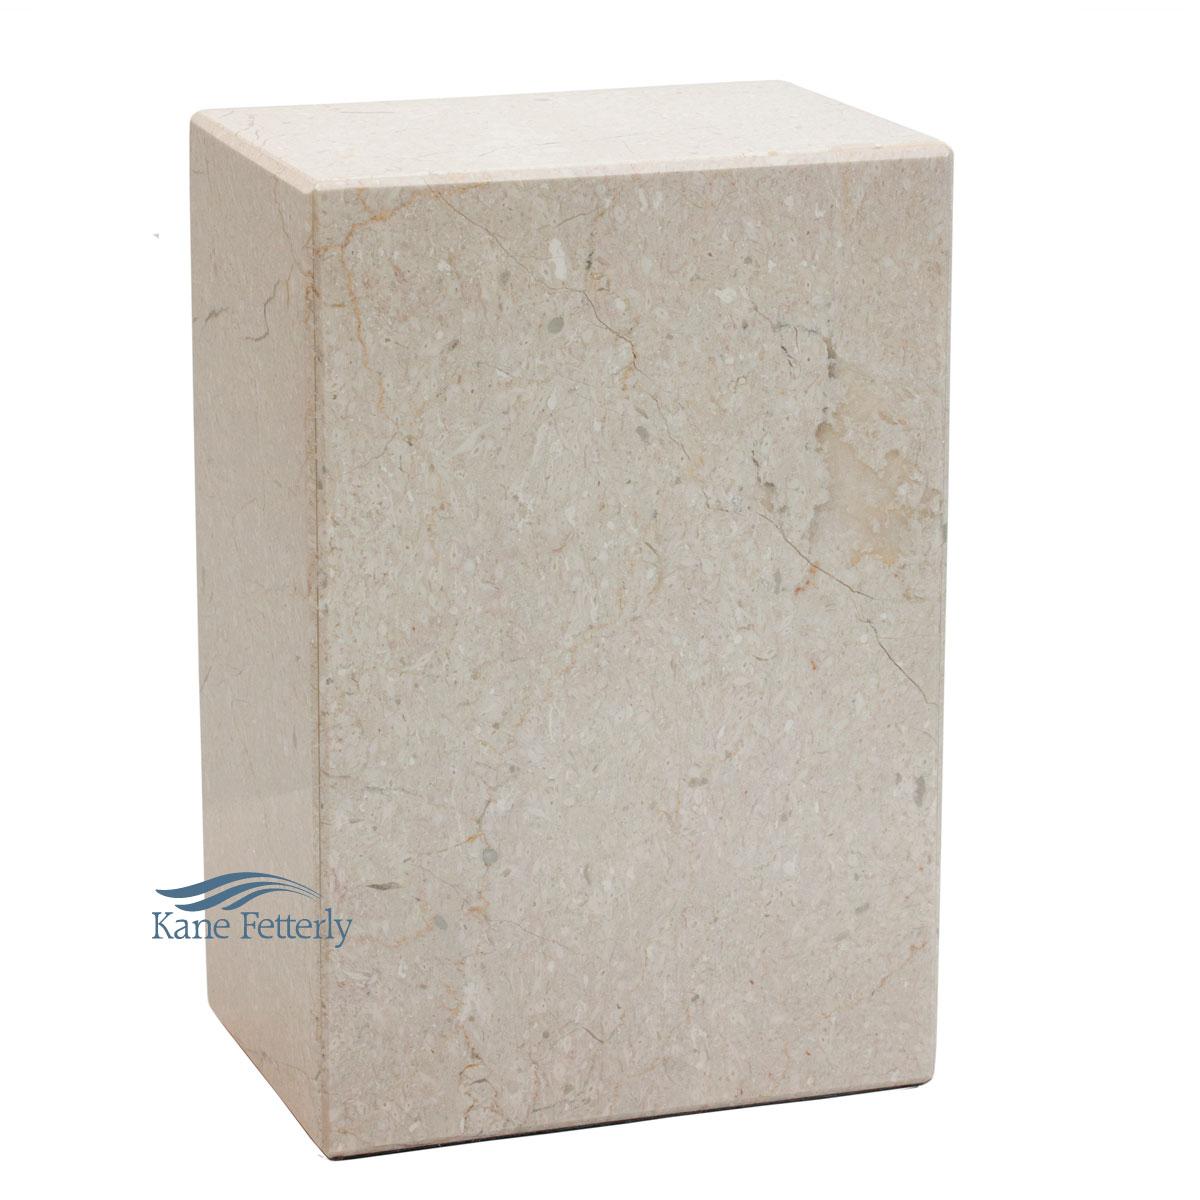 U6443 Beige natural marble urn